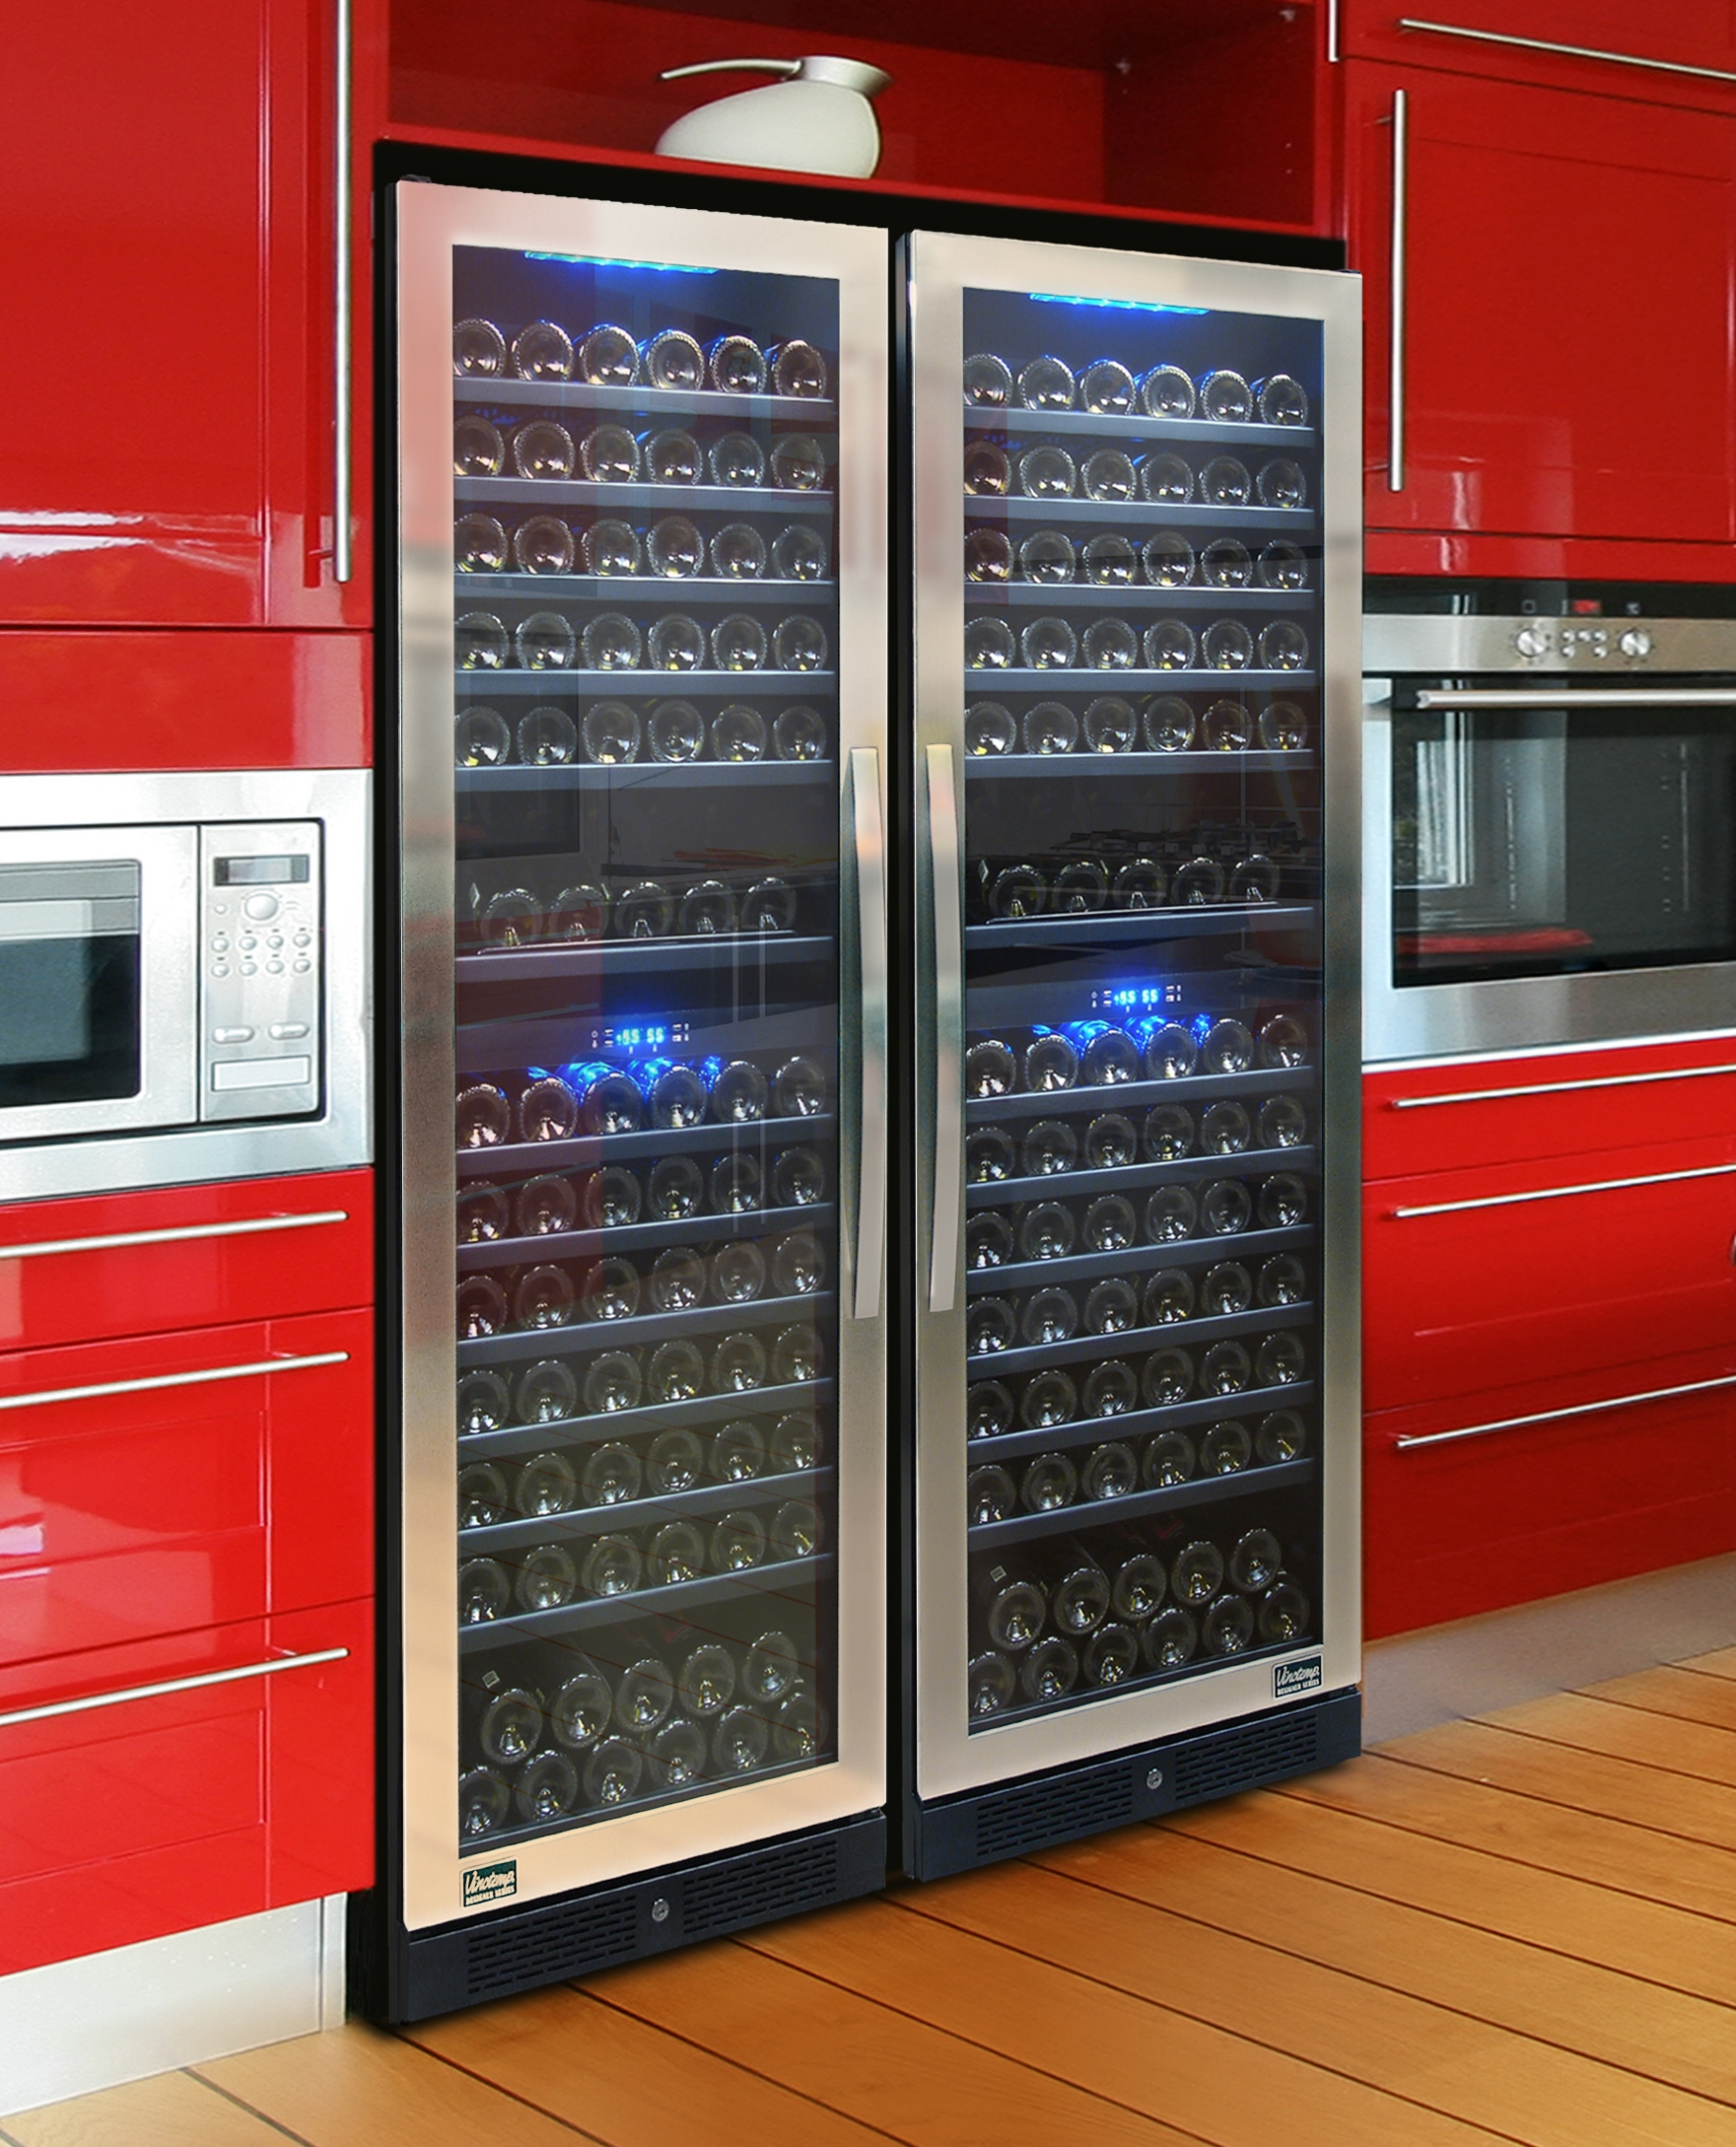 dual install of vinotemp designer series 149 bottle seamless dualzone wine cooler with new standard feature vinotemp blu blue led wine cooler interior - Vinotemp